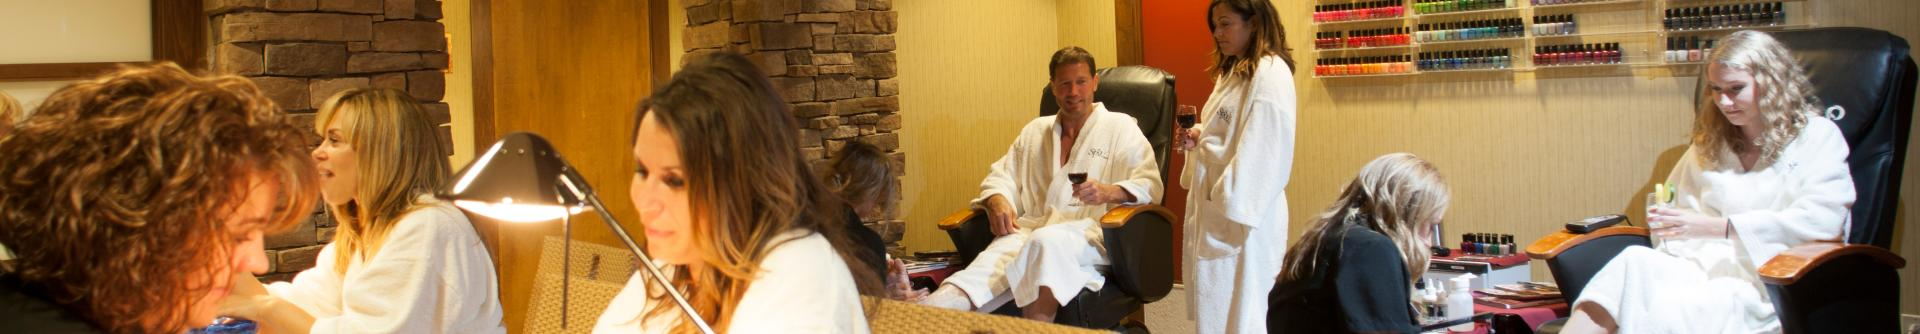 Relax at Bear Creek Mountain Resort